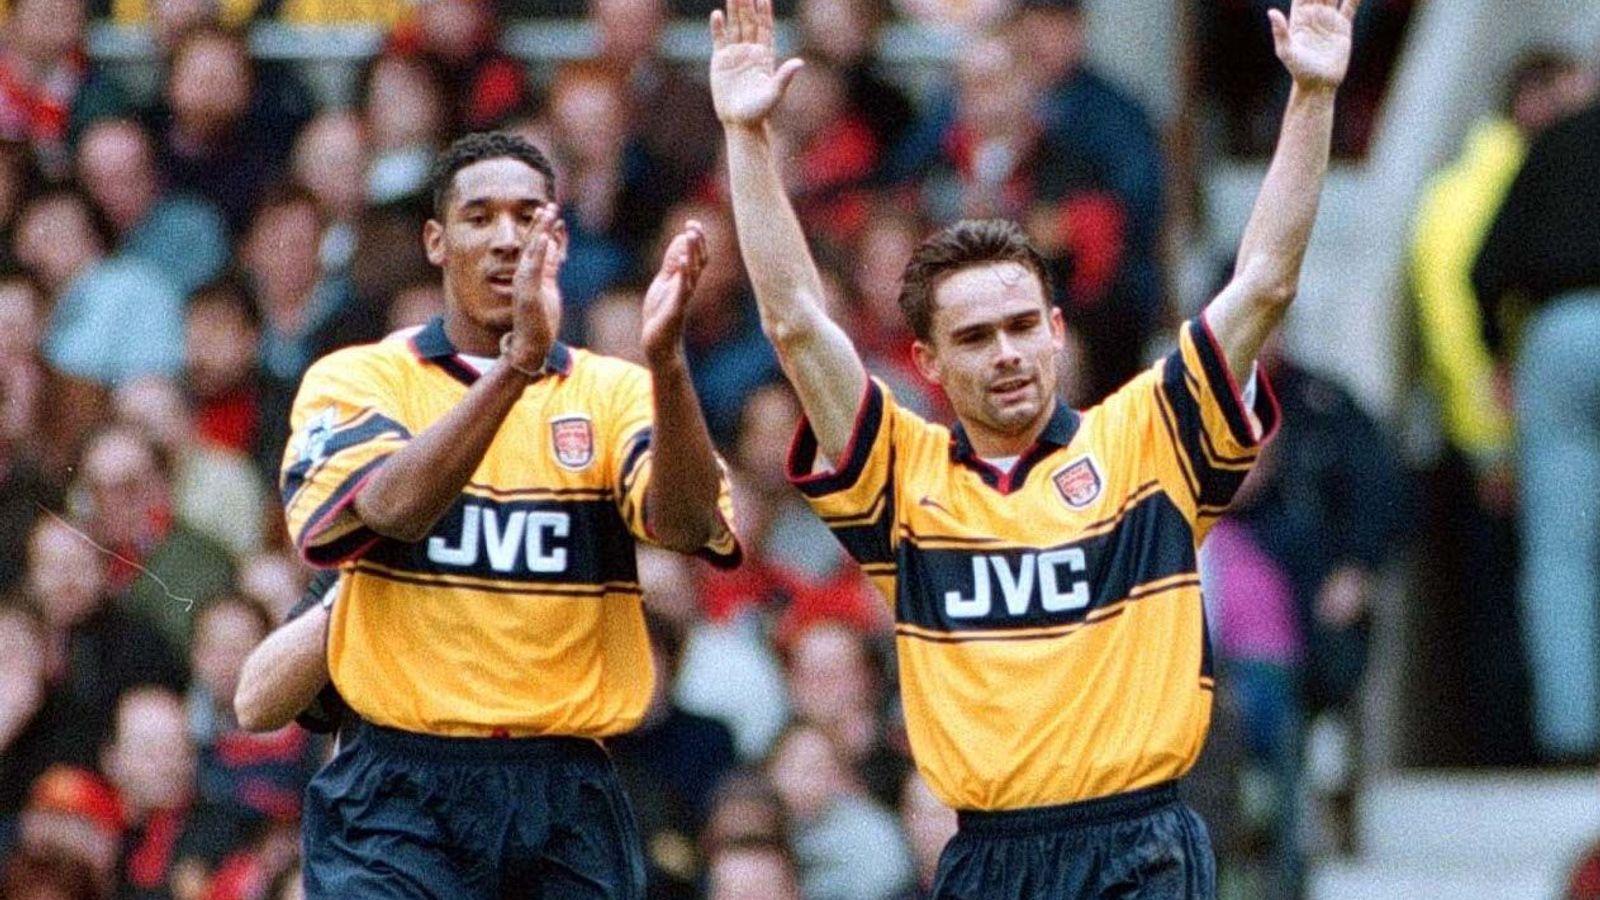 1997/98 Premier League Season Review